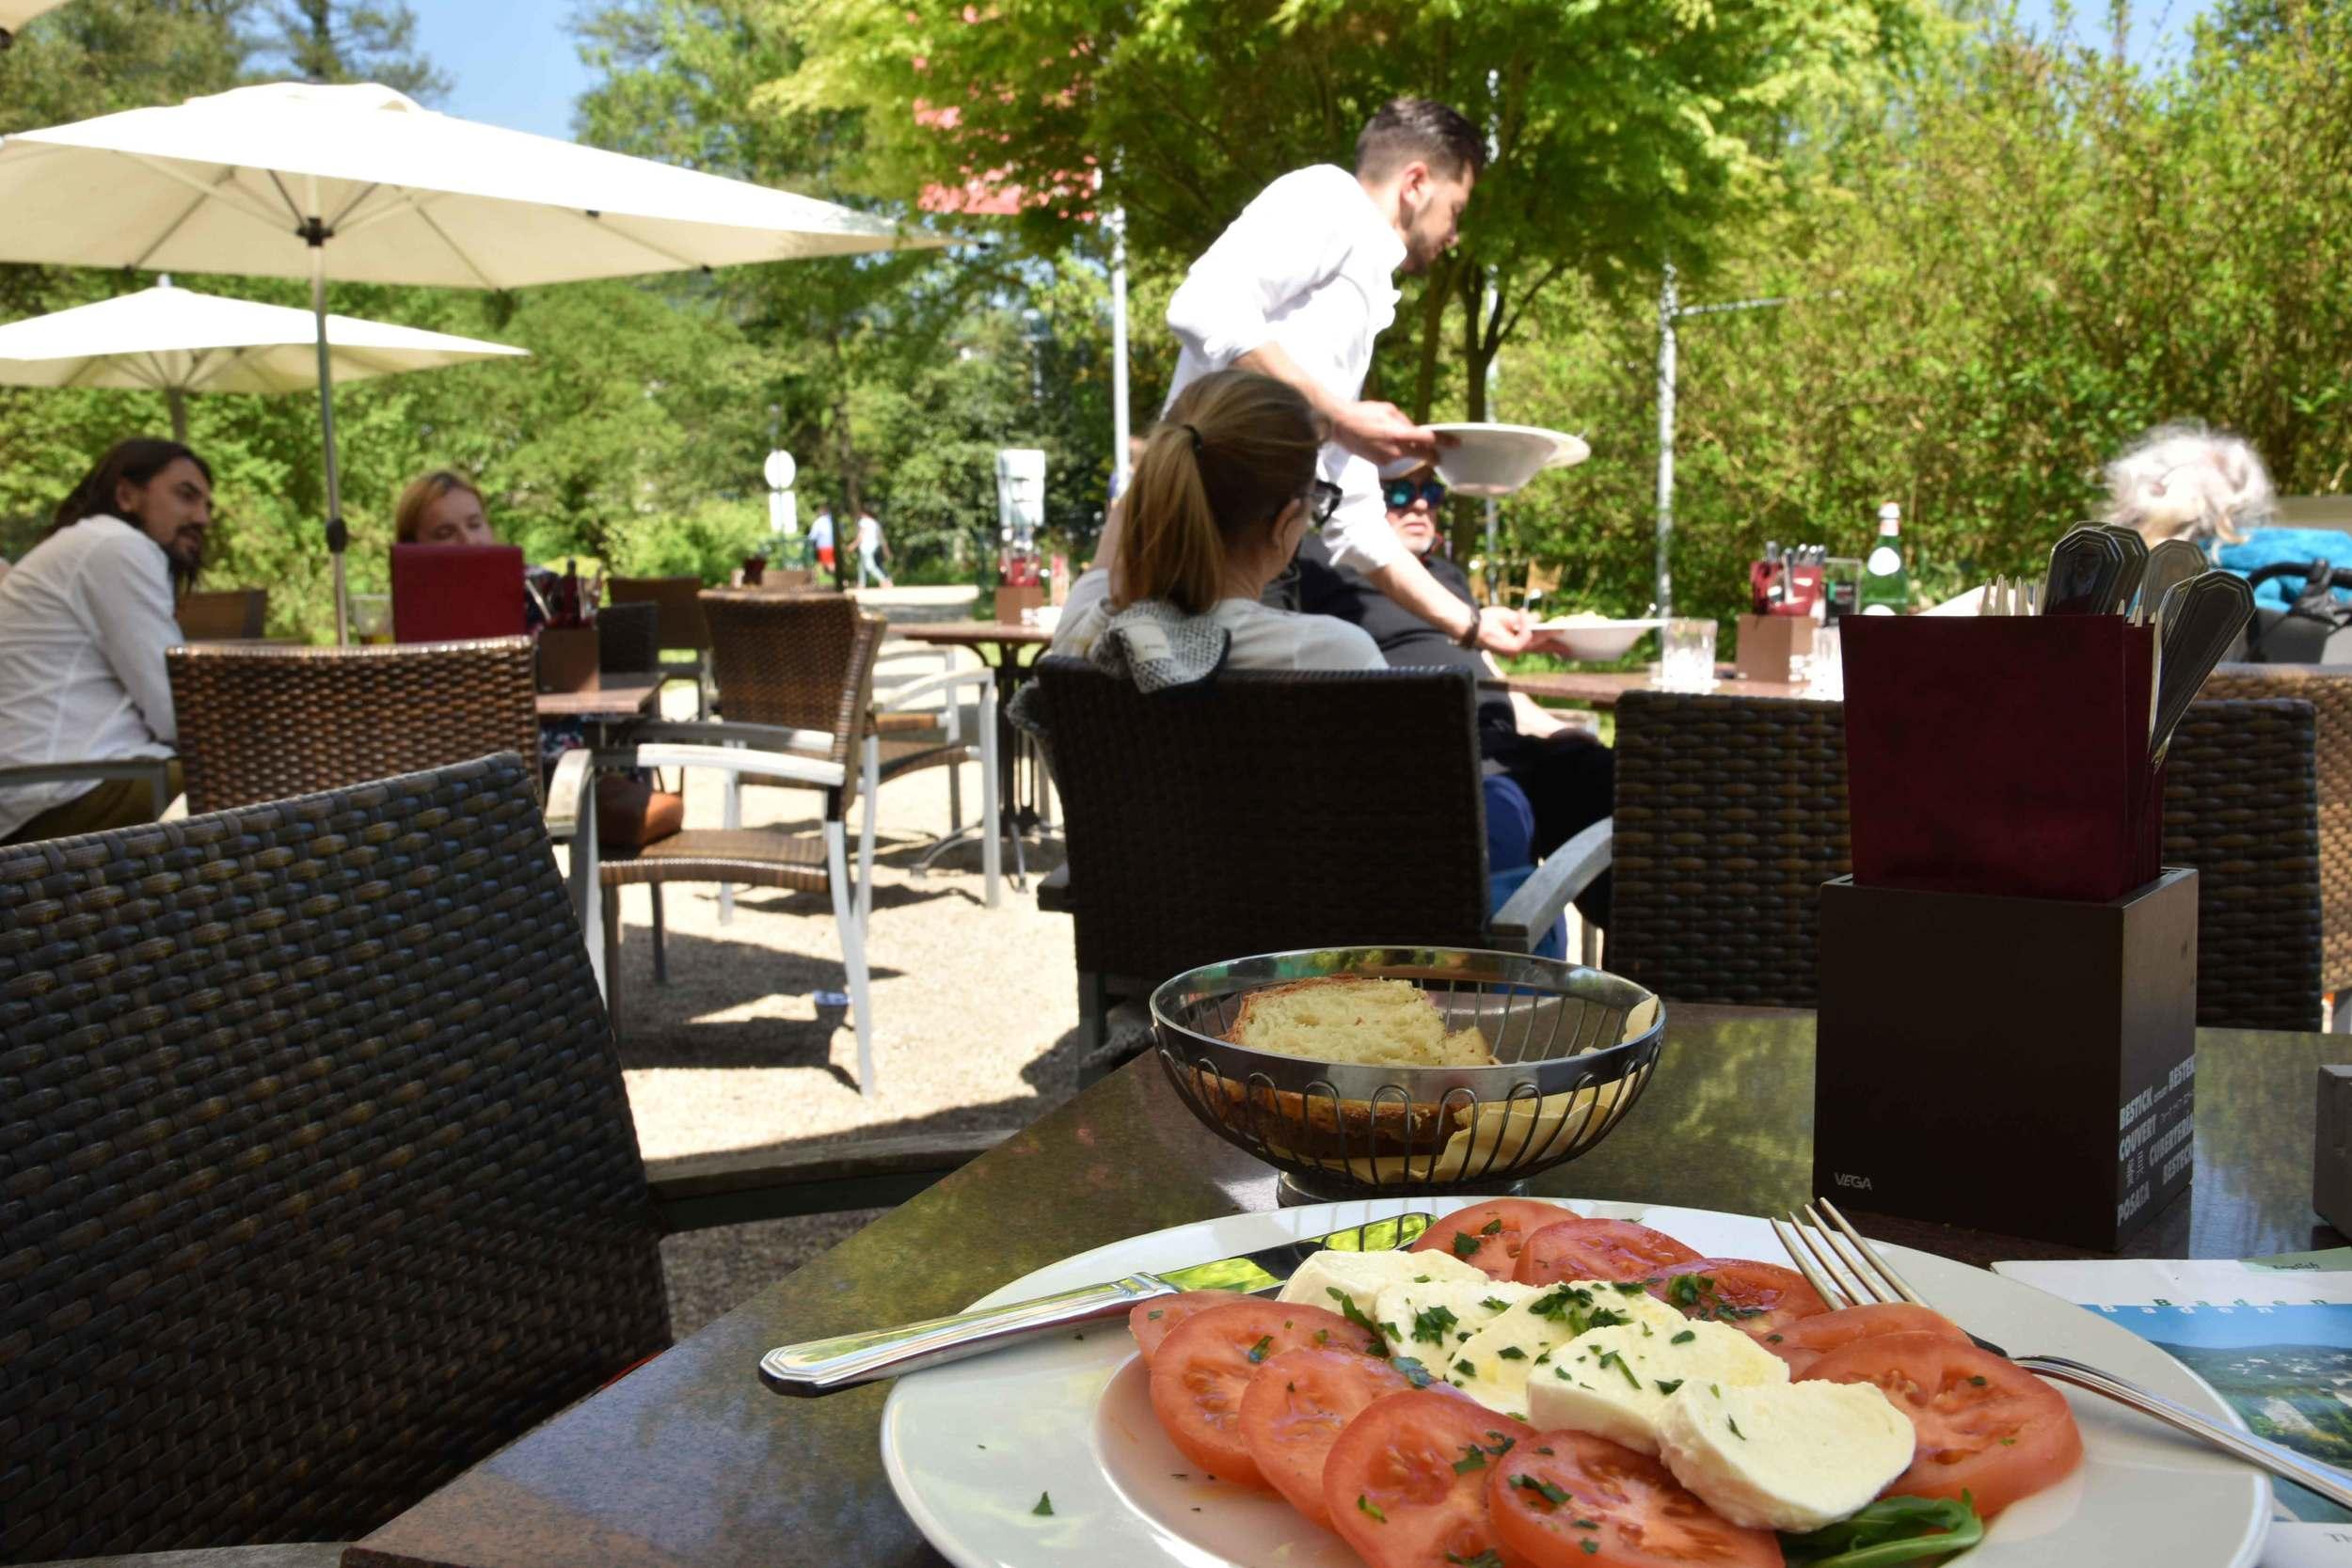 Mozarella and tomato salad, Baden Baden, Germany. Image©sourcingstyle.com